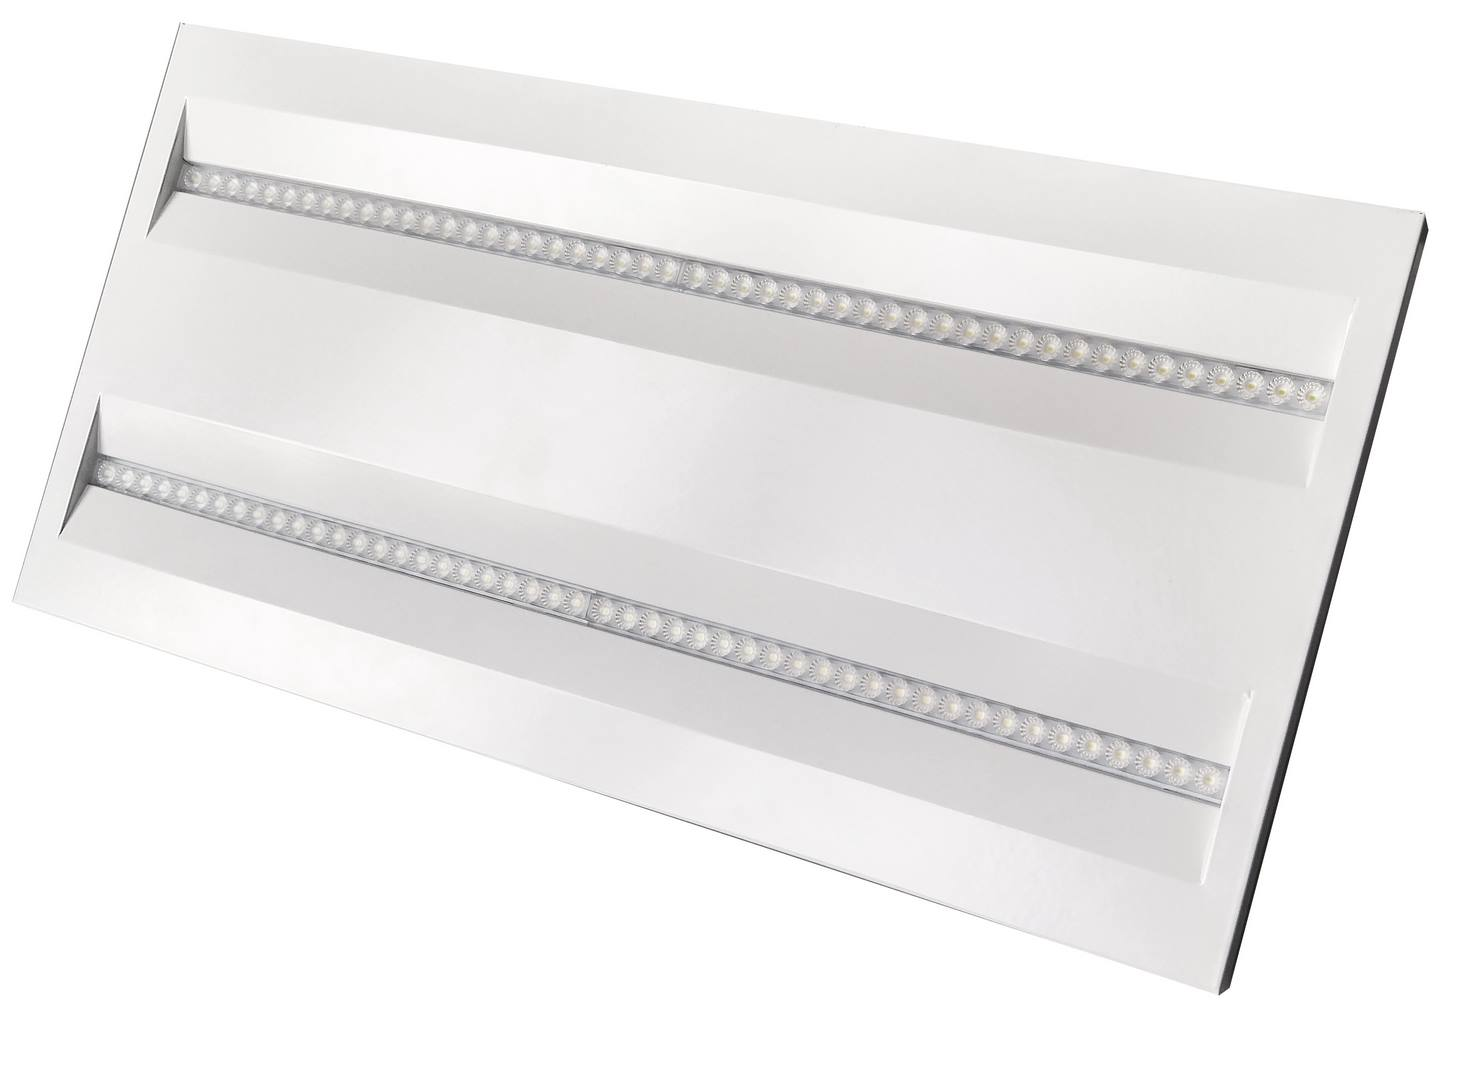 LED panel VIRGO PROFI MINI 36W N2A NW/840 GREENLUX (GXPR041)